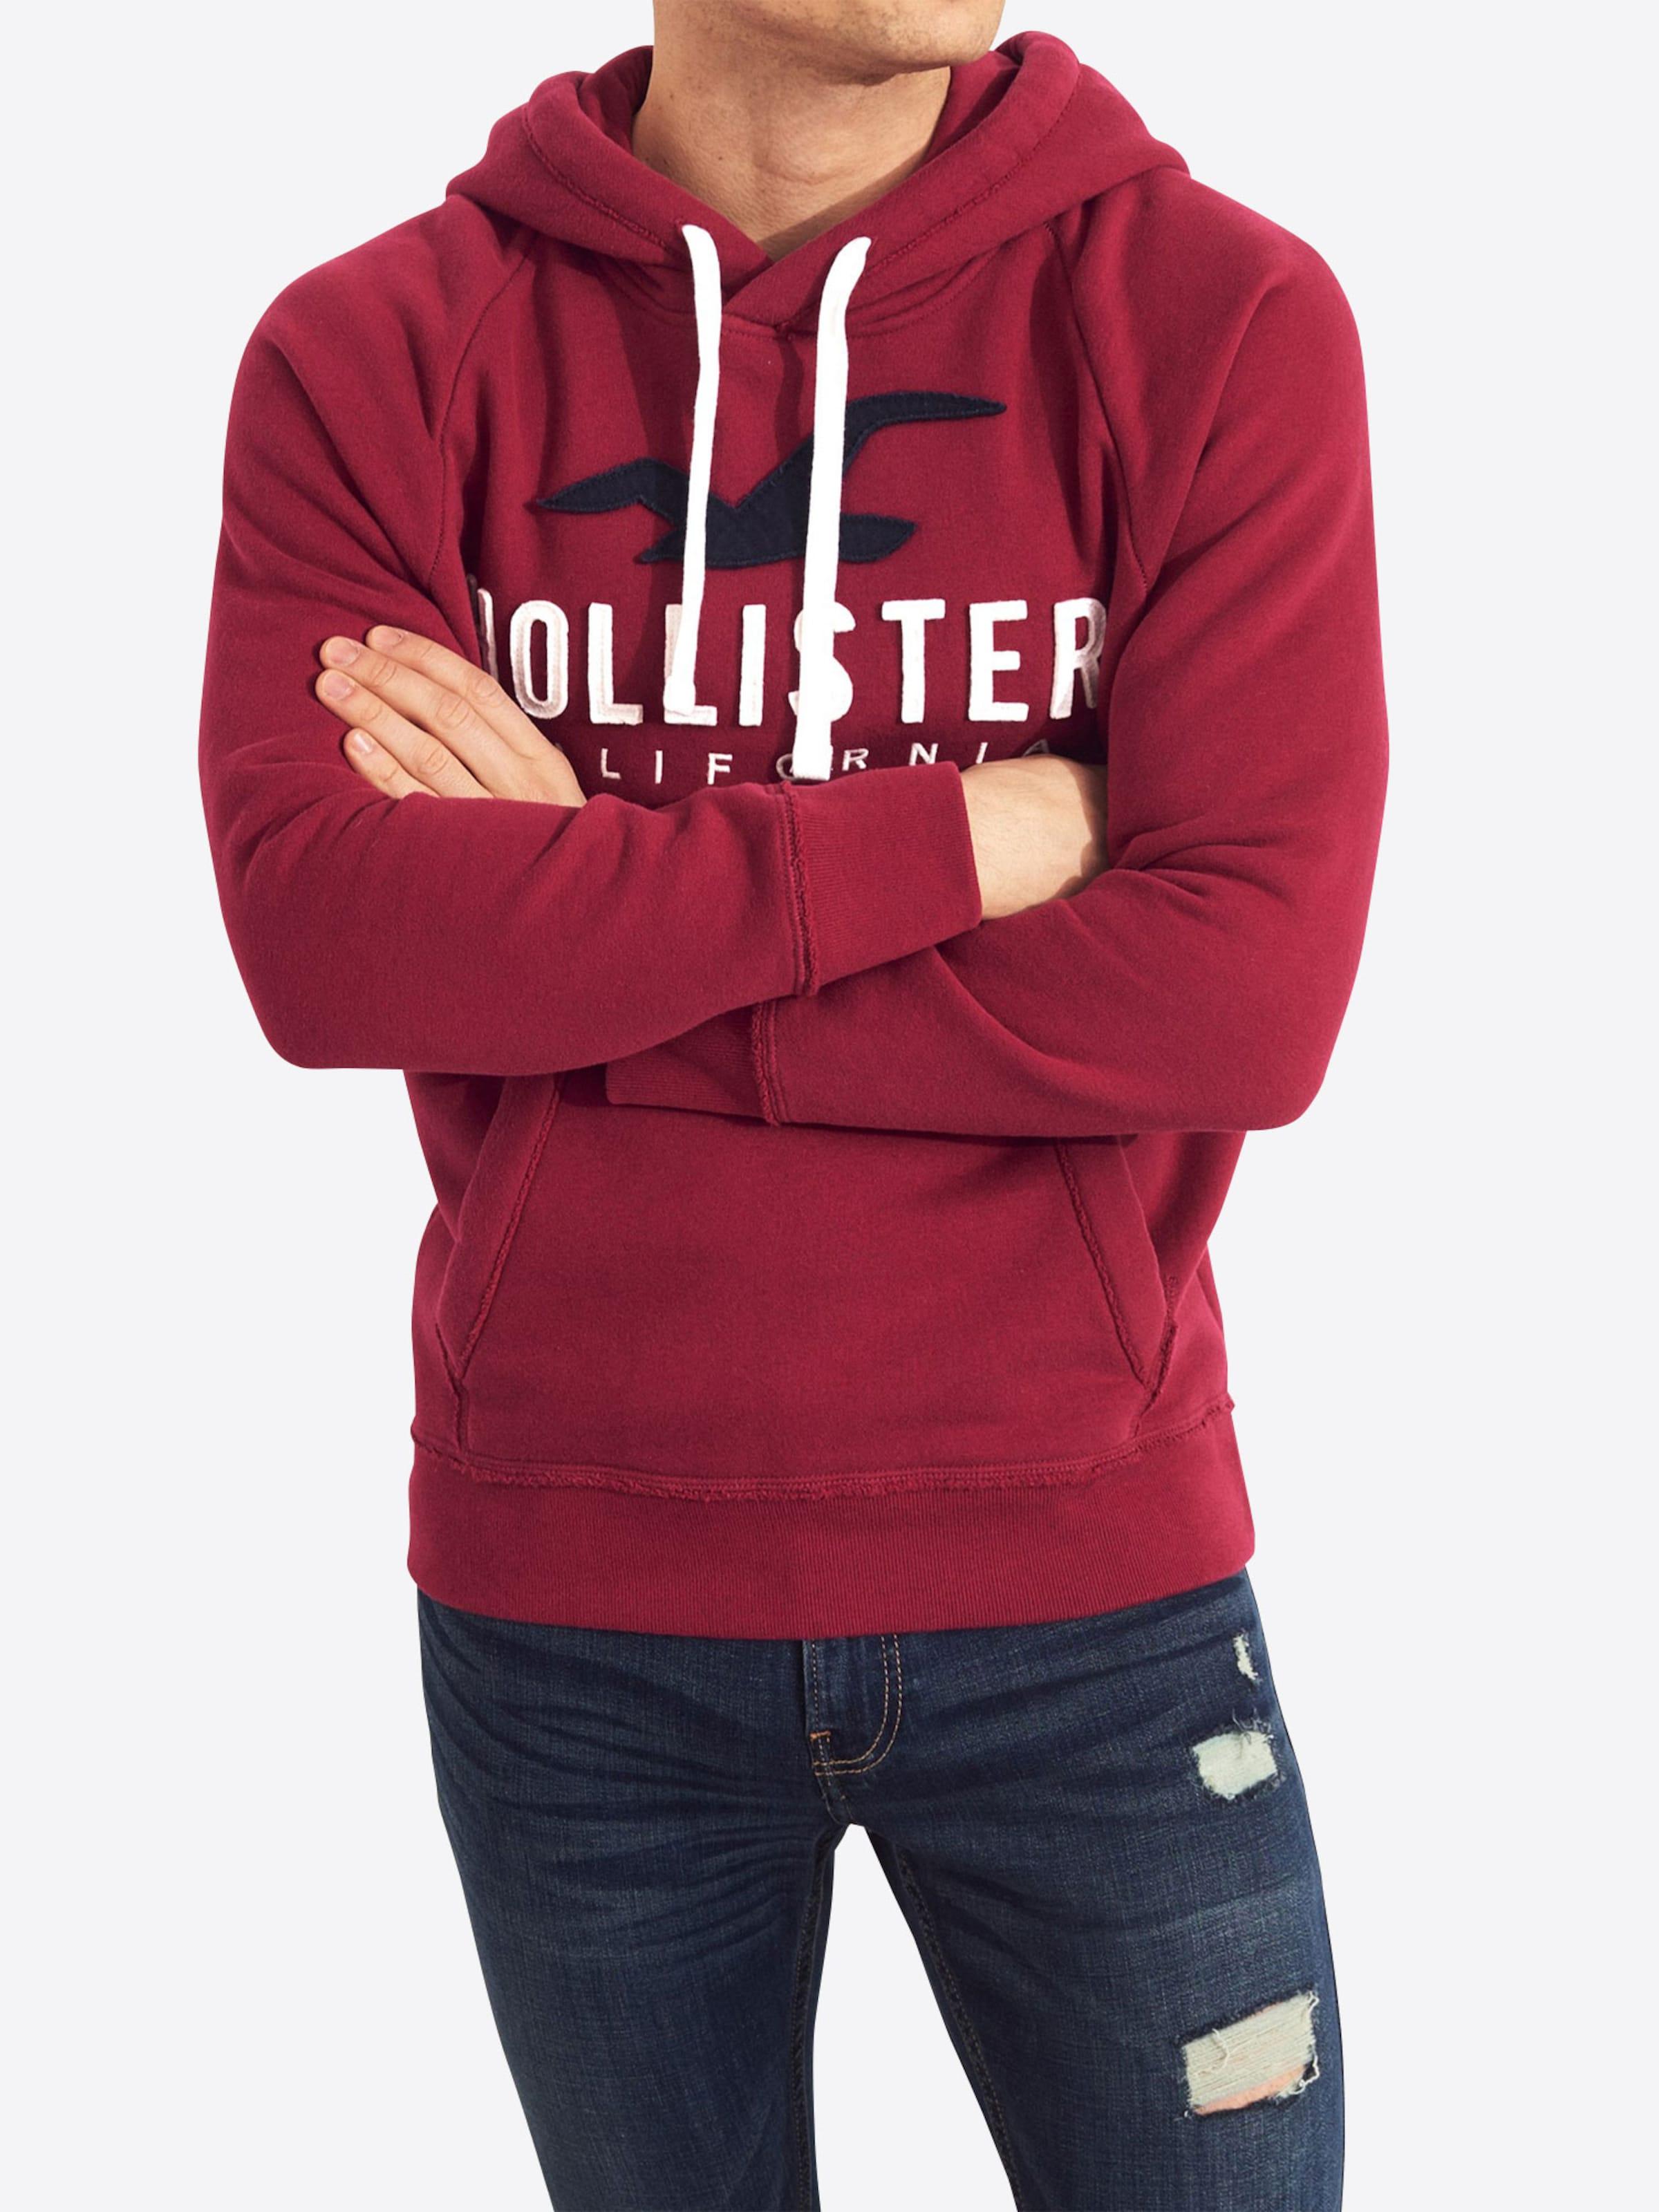 Sweatshirt Rostbraun Hollister Sweatshirt Hollister In In Hollister In Sweatshirt Rostbraun ZlPukwOXiT